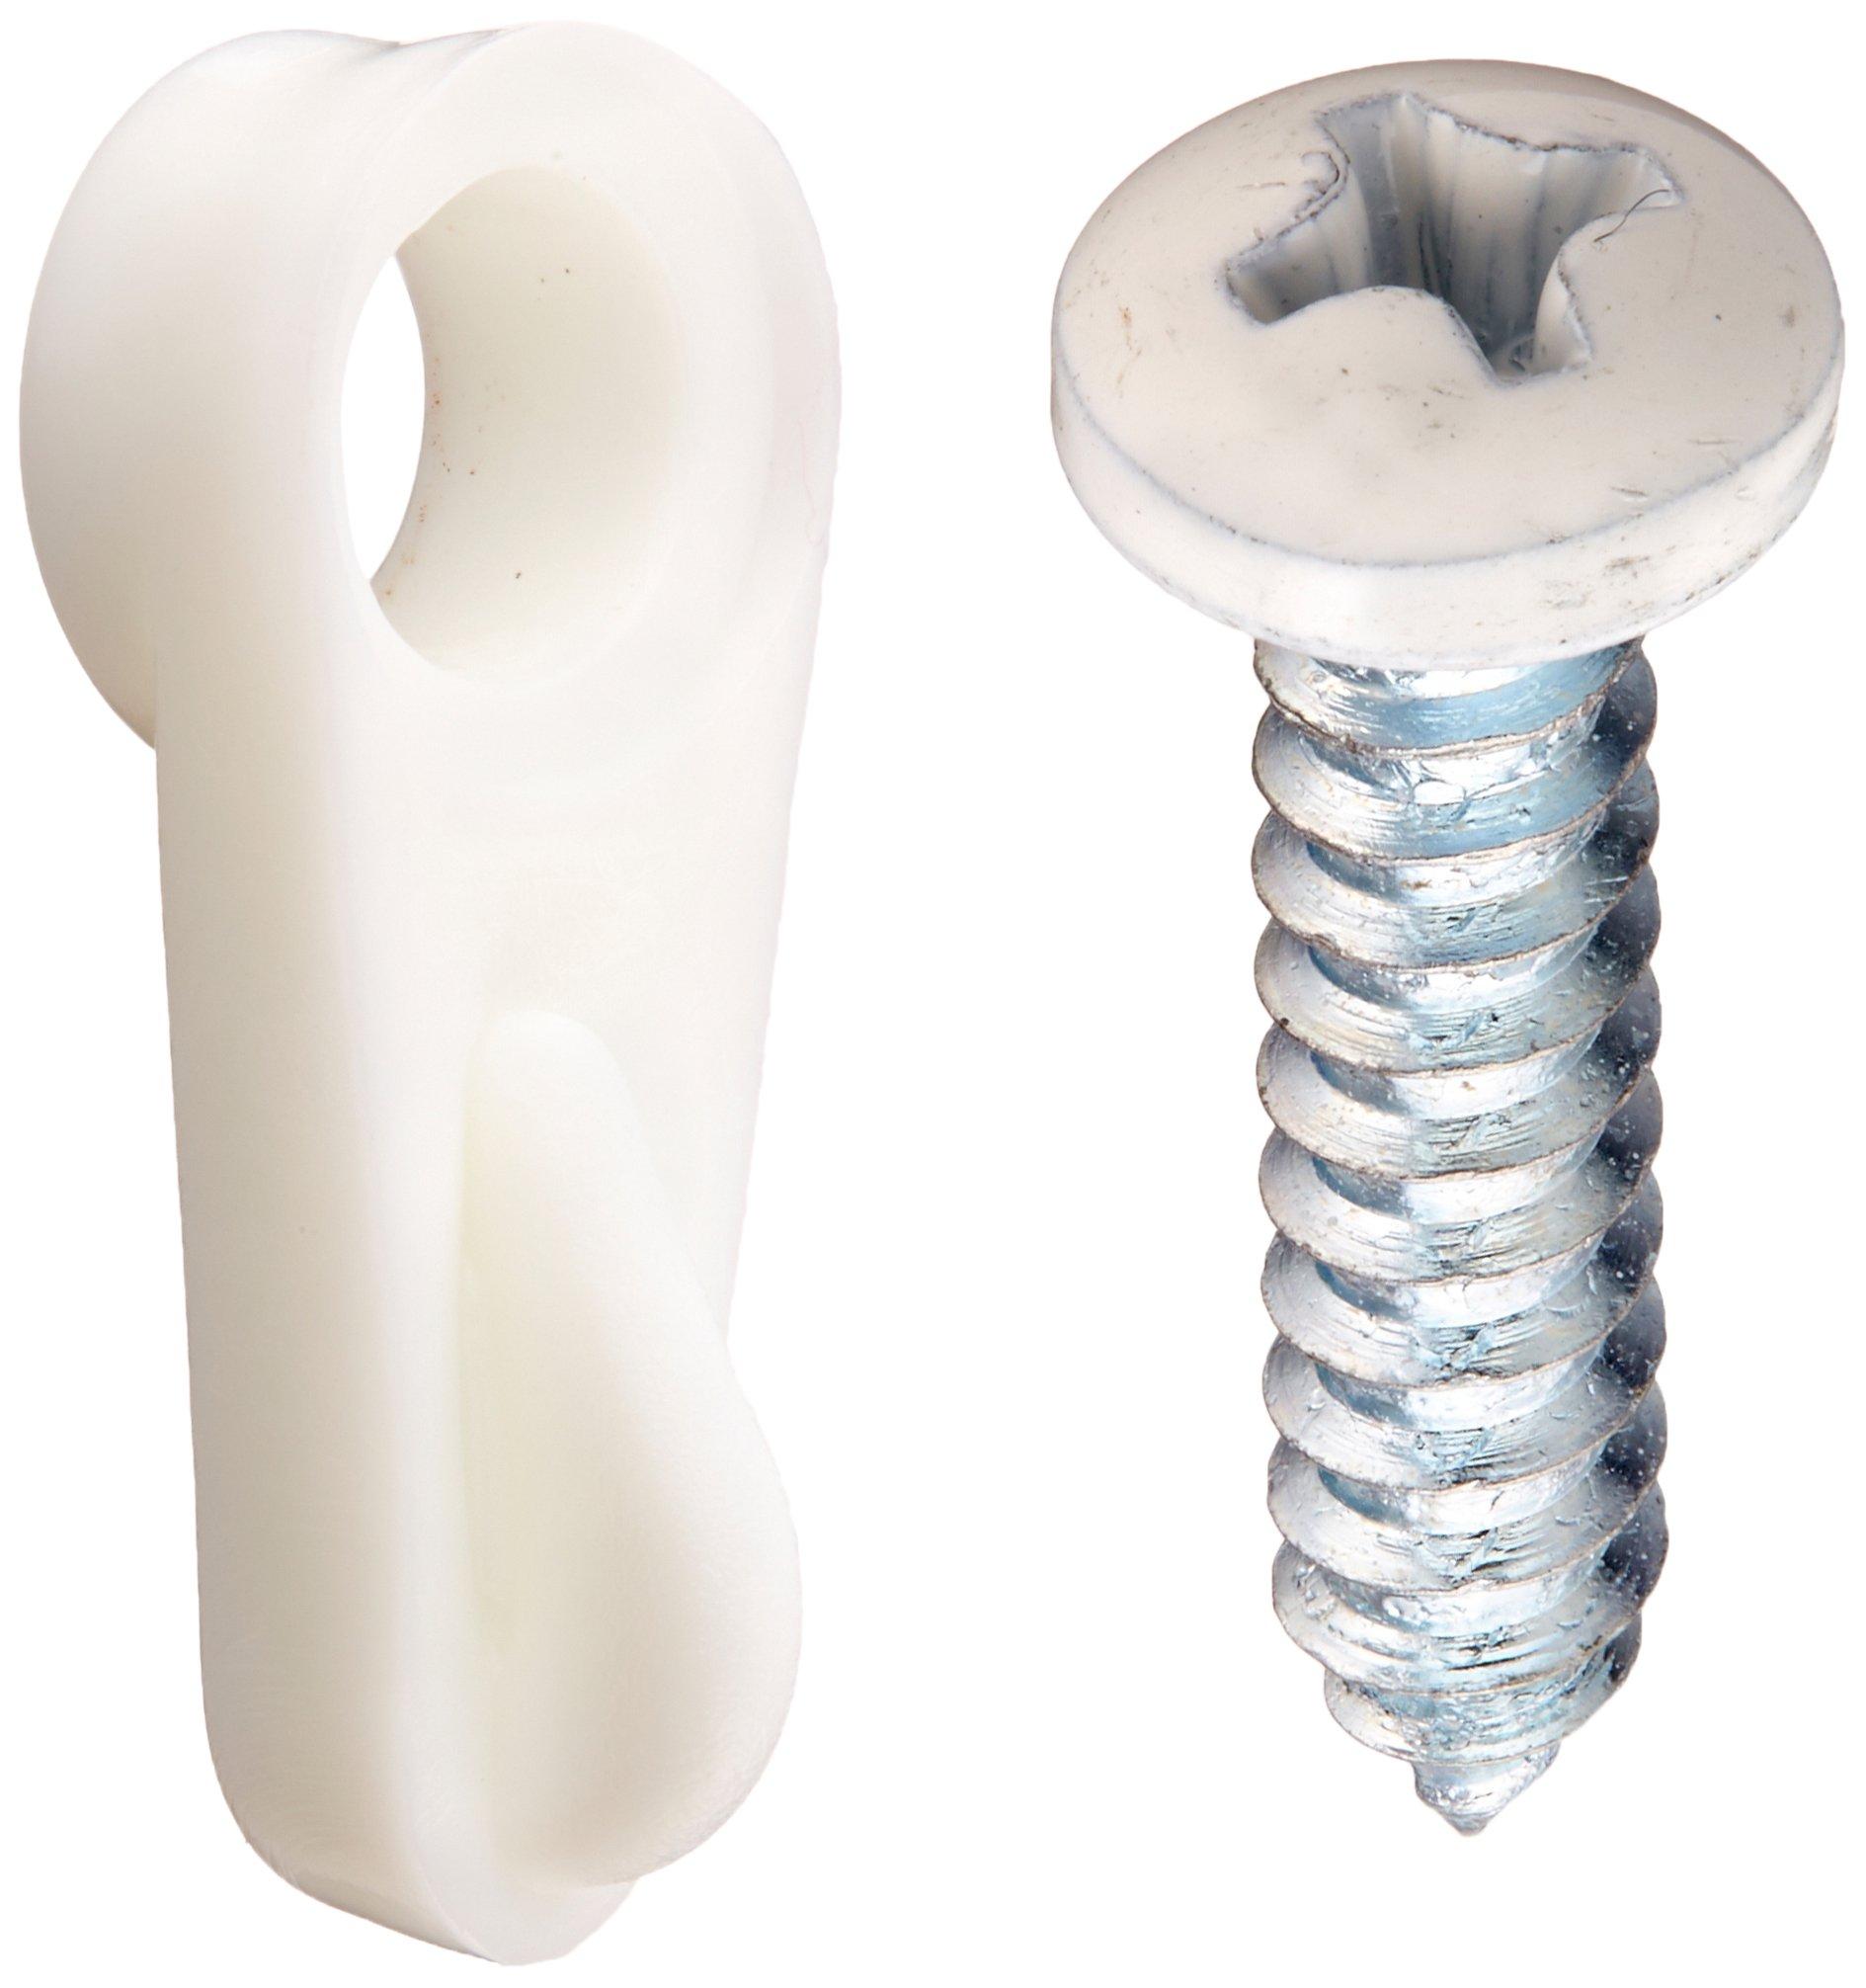 Piece-100 Hard-to-Find Fastener 014973208127 White Phillips Pan Sheet Metal Screws 8 x 2-1//2